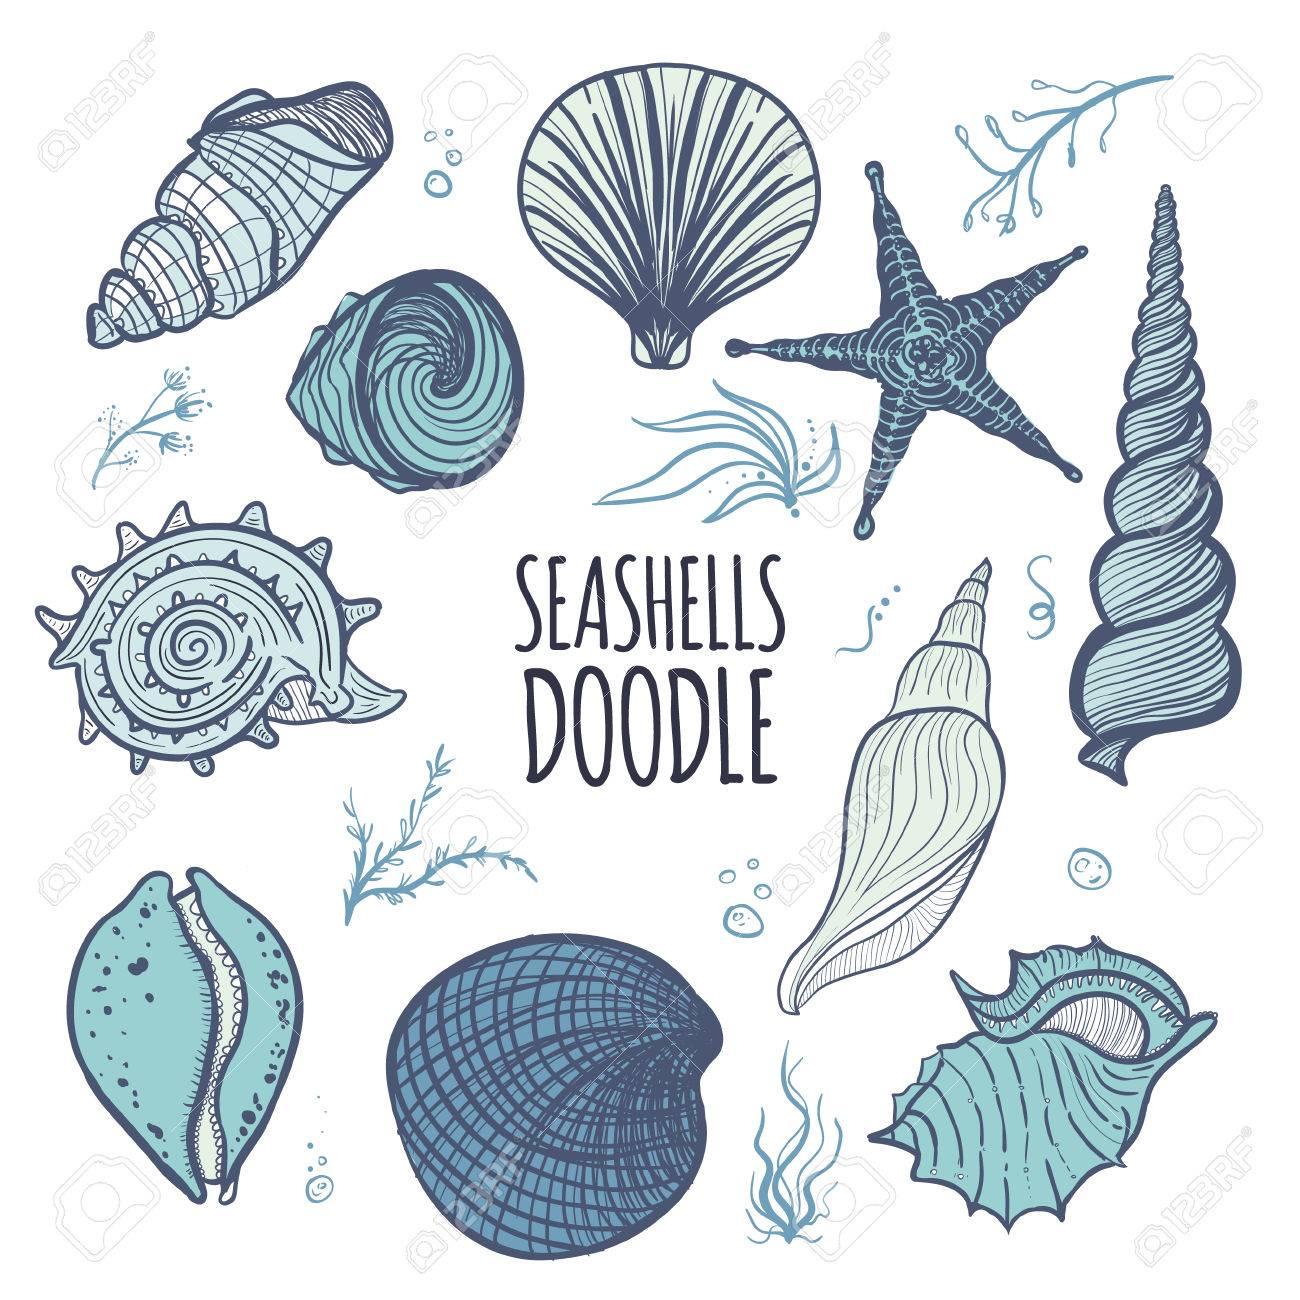 Vettoriale Insieme Variopinto Dei Seashells Su Priorità Bassa